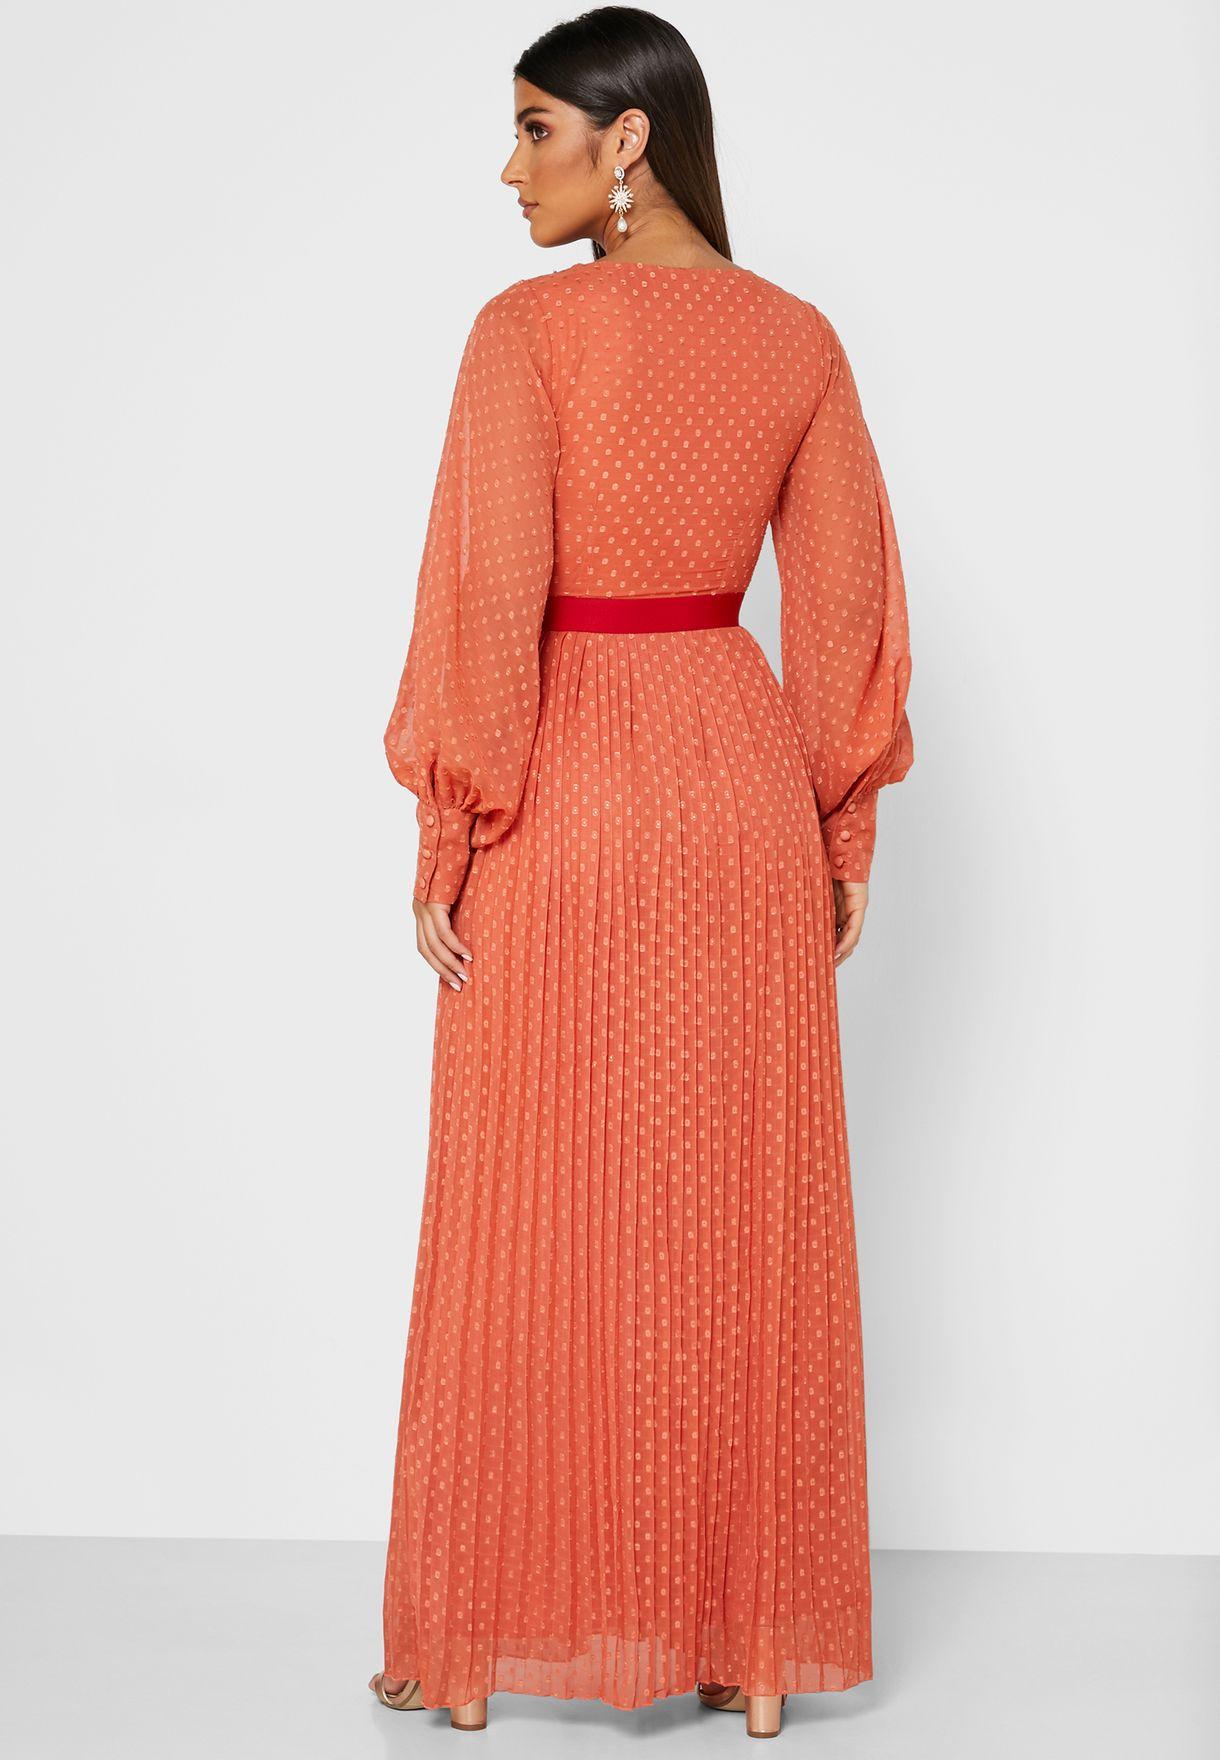 Lace Trim Balloon Sleeve Dress